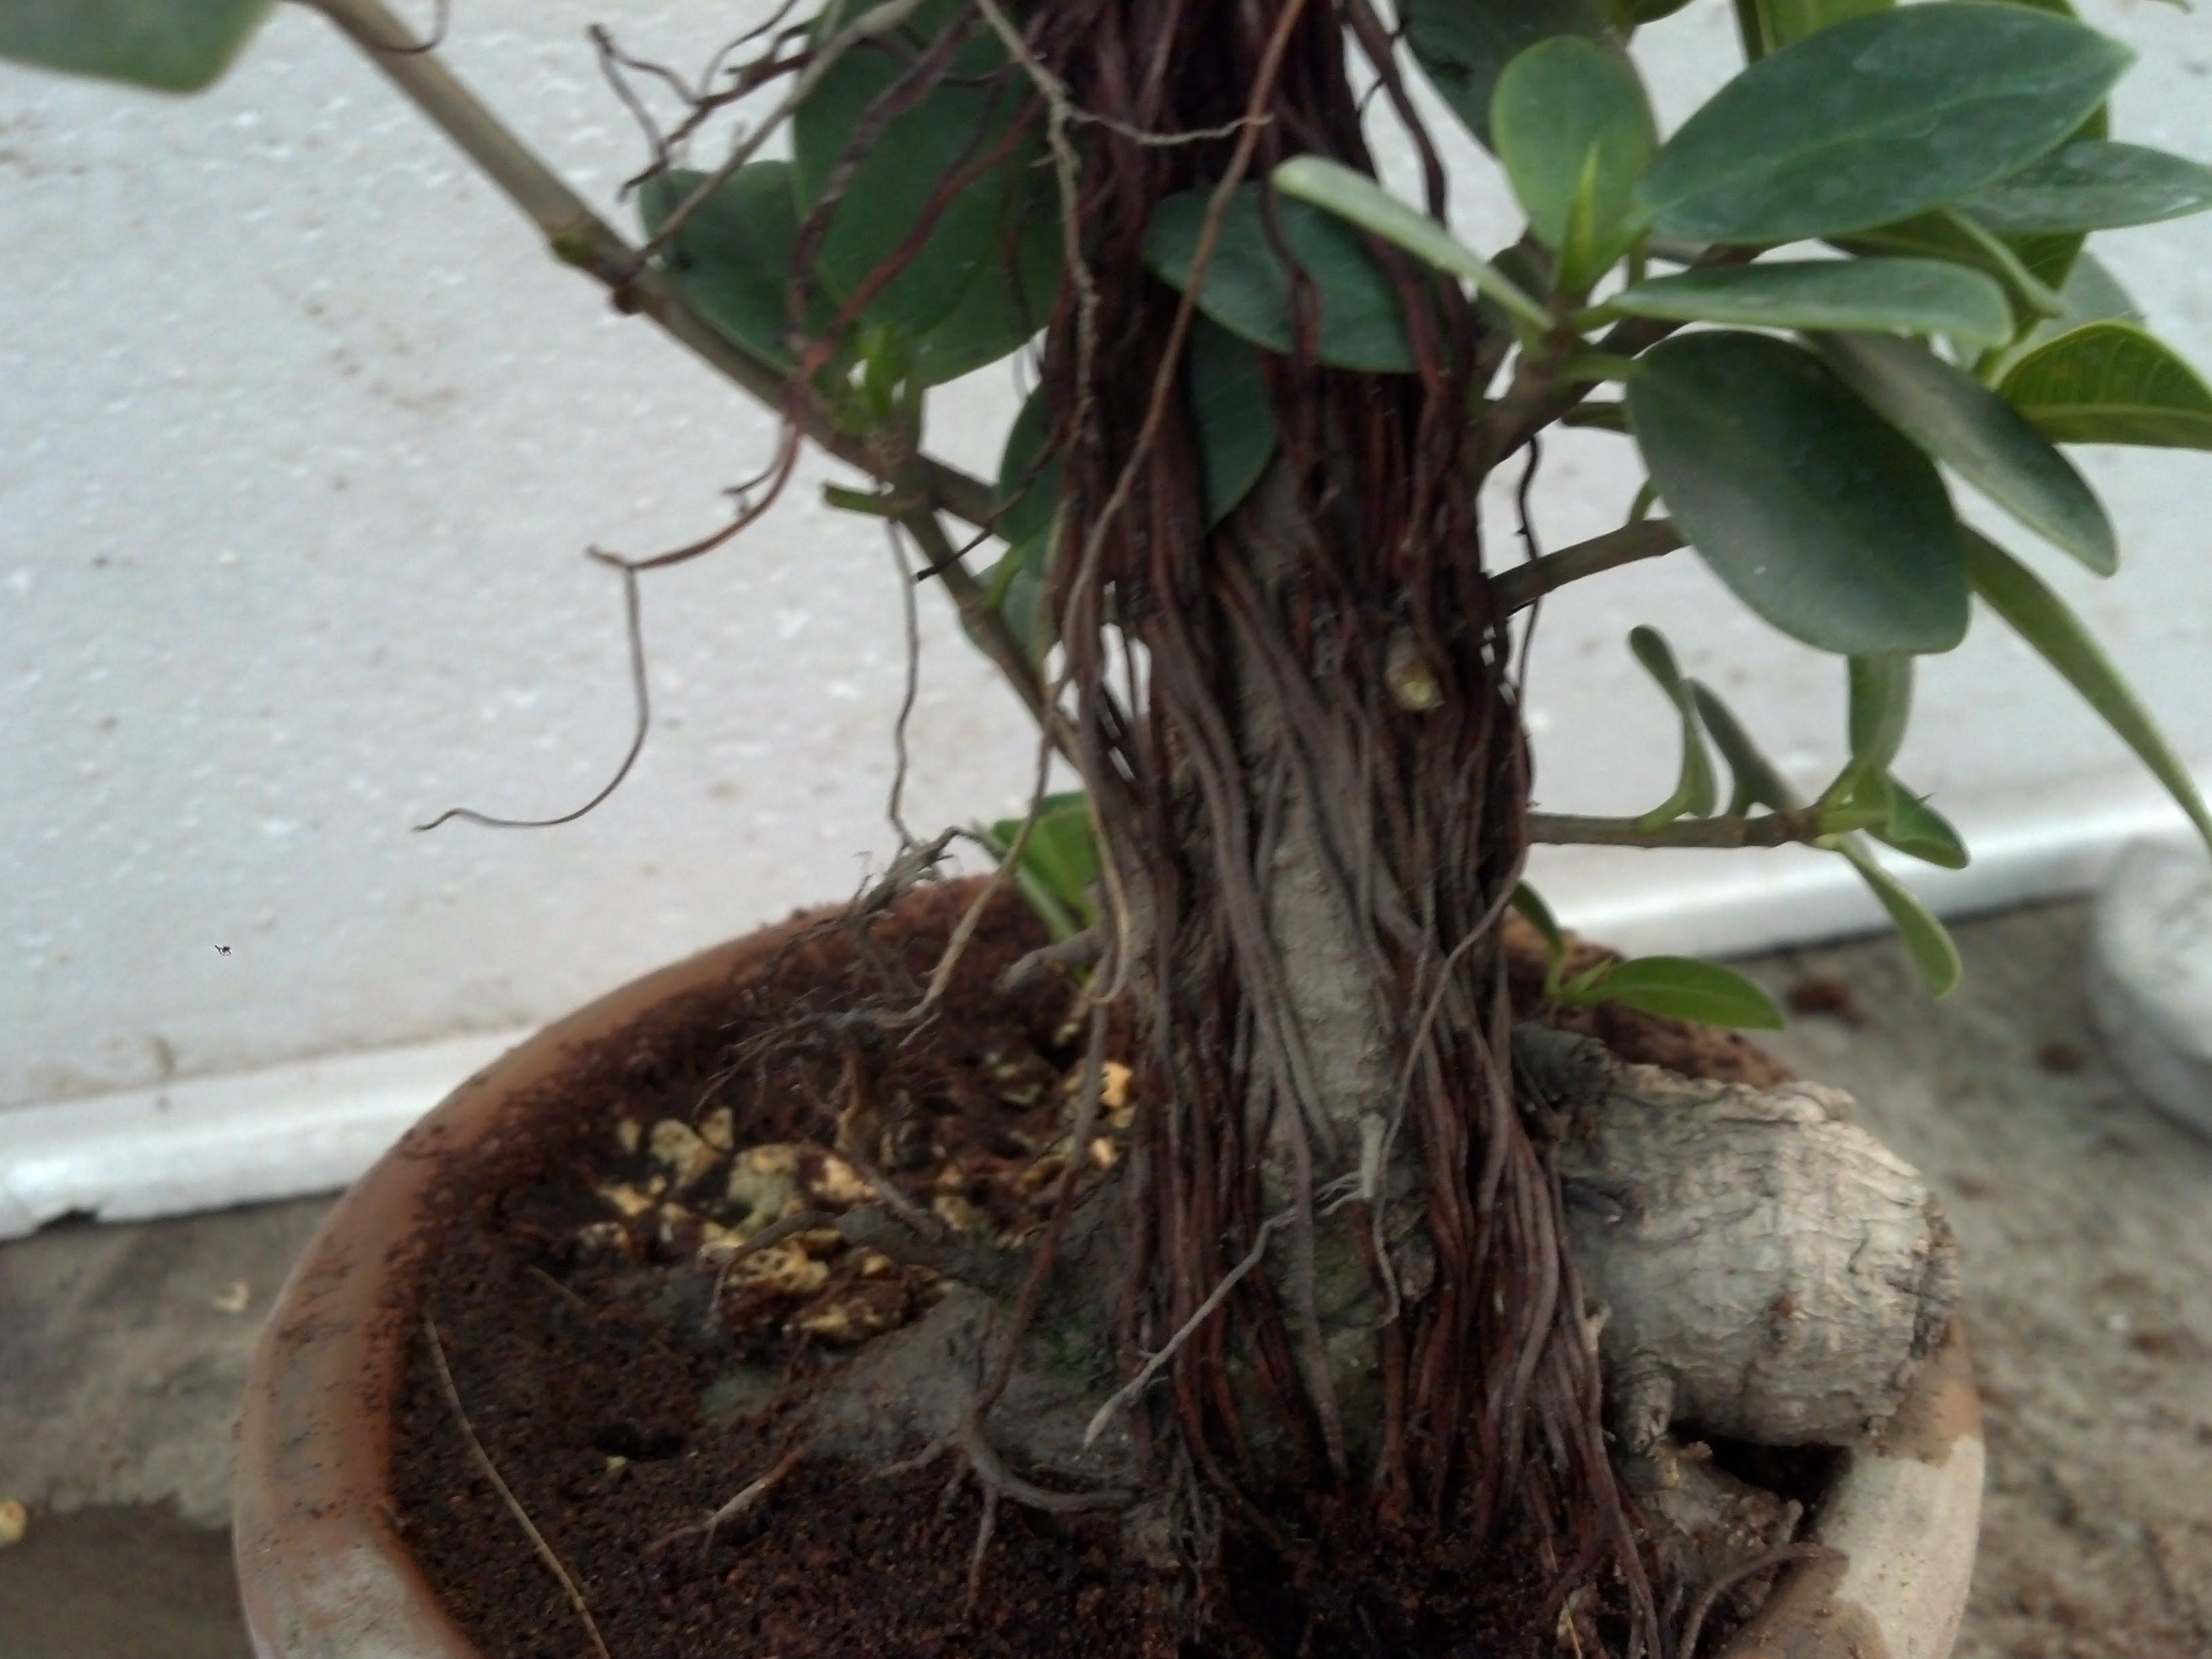 How To Repotting Ficus Bonsai Tree Ficus Microcarpa Ginseng August 2 Ficus Microcarpa Bonsai Tree Ficus Bonsai Tree